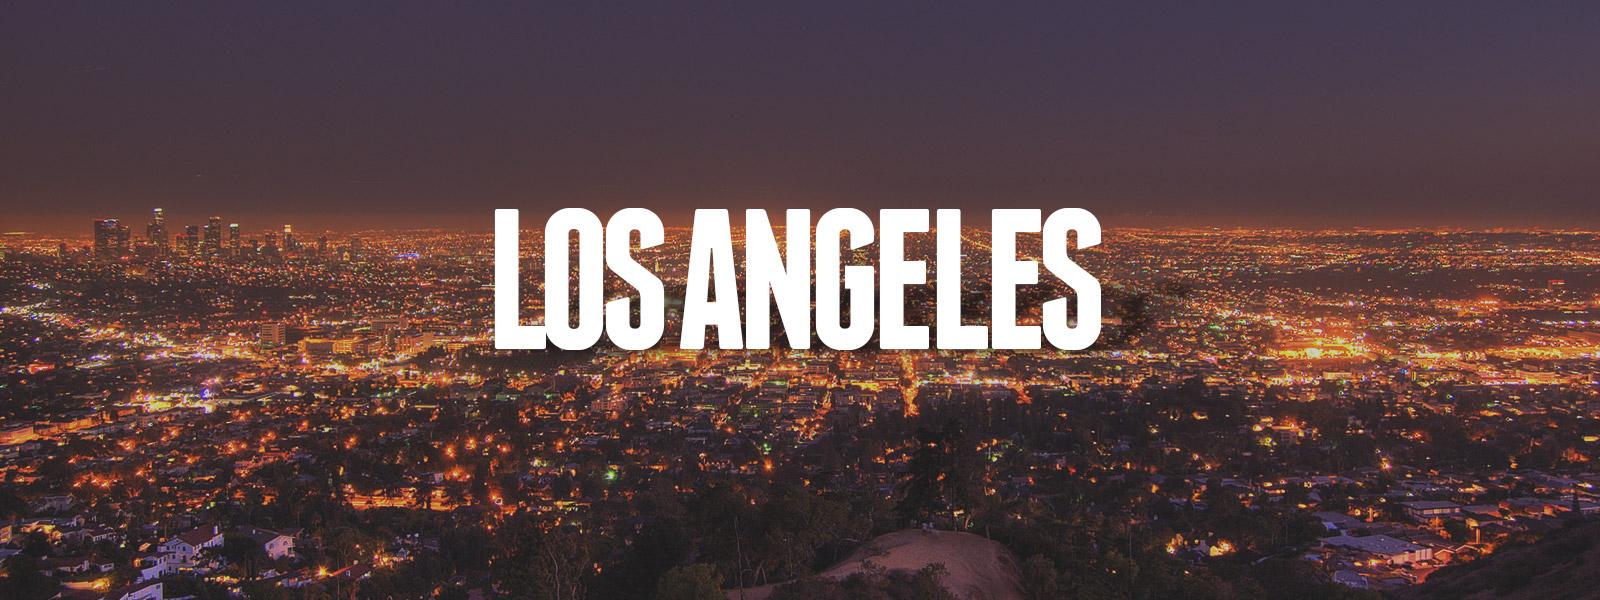 Expansive, unbounded L.A.